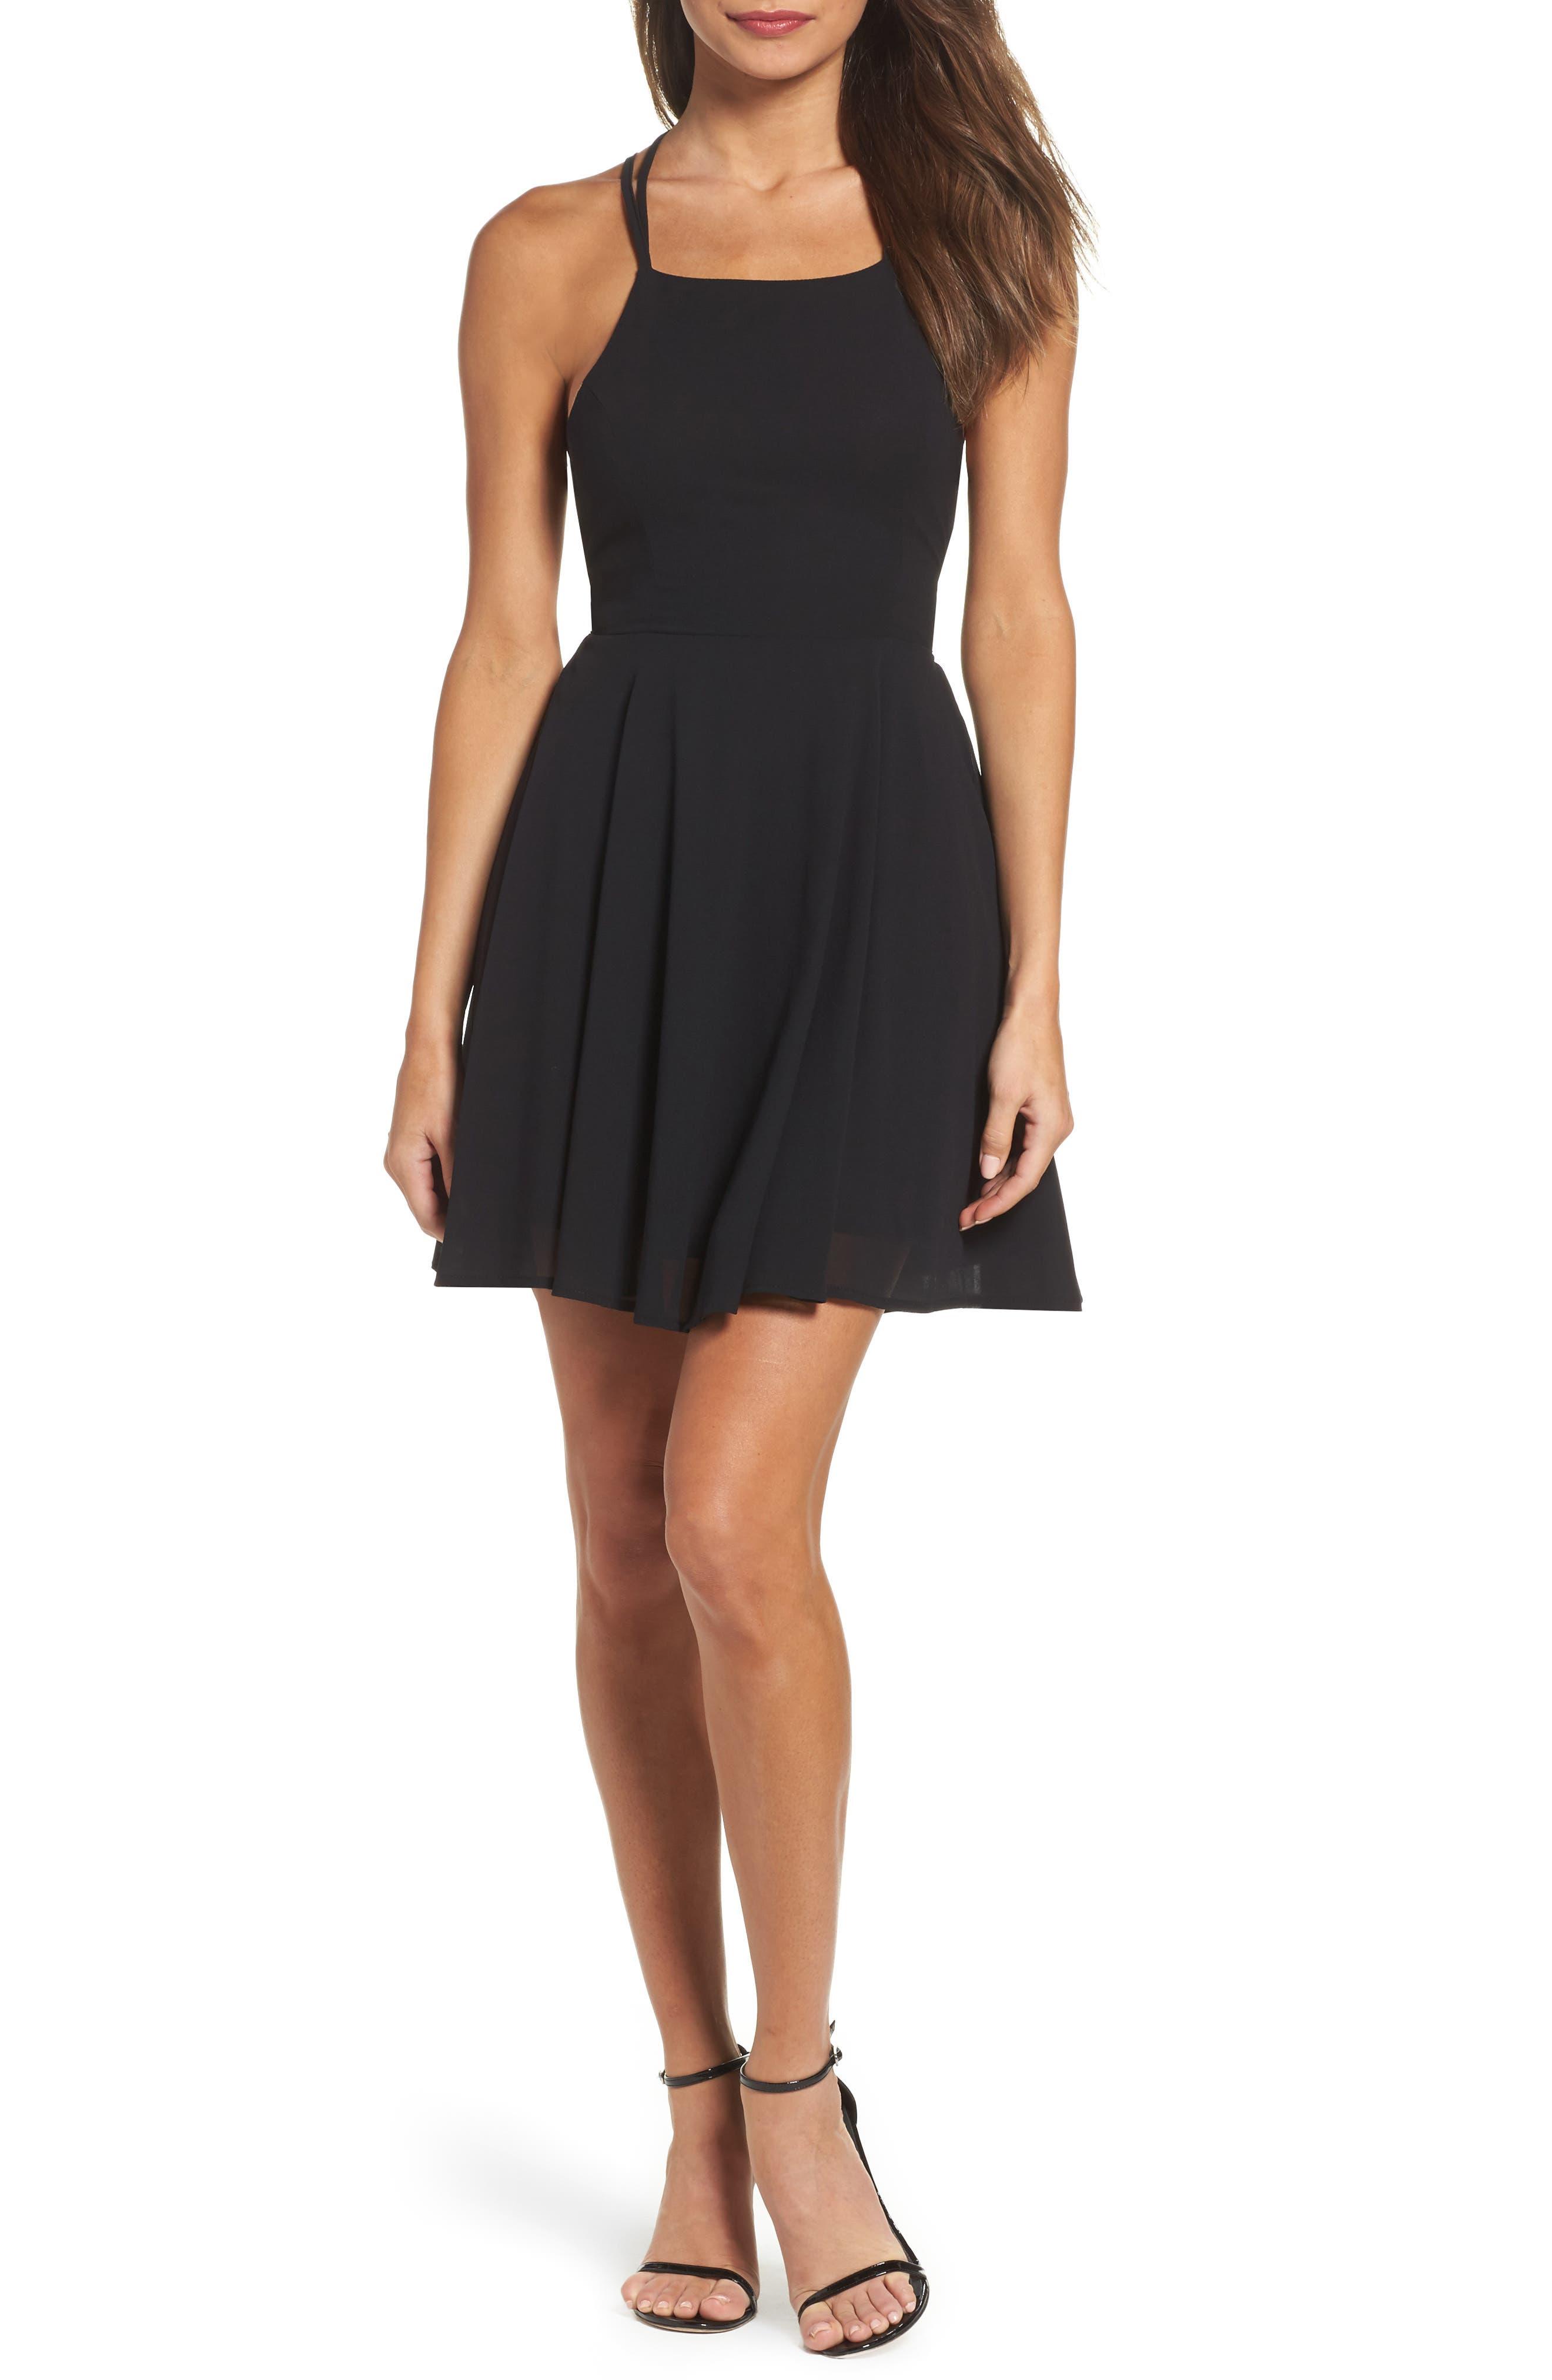 Good Deeds Lace-Up Skater Dress,                             Main thumbnail 1, color,                             Black